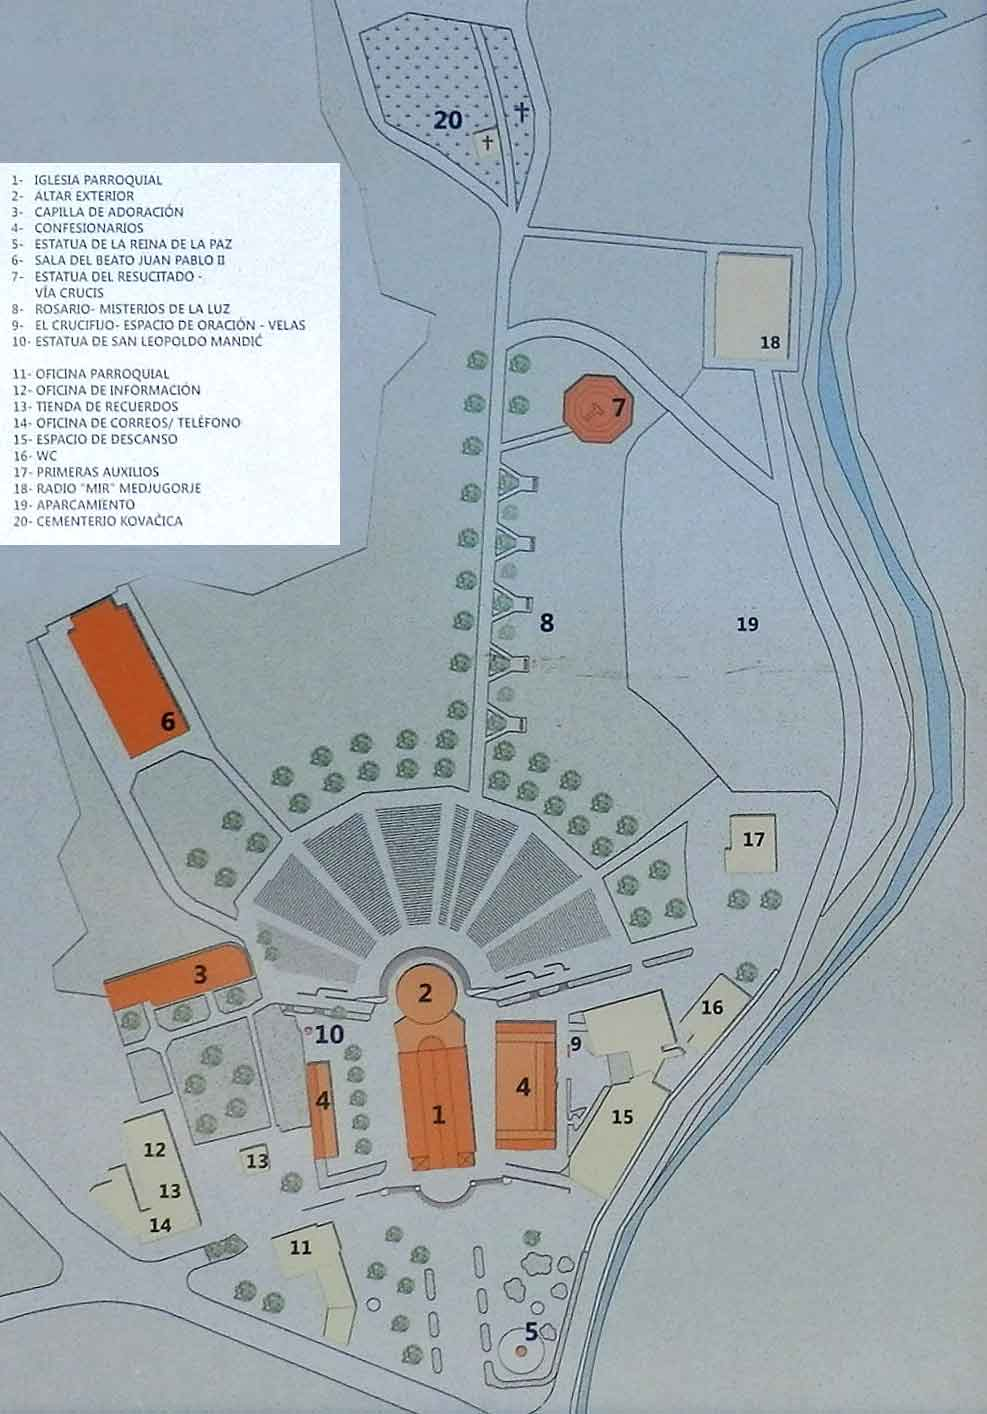 plano situacion parroquia Medjugorje